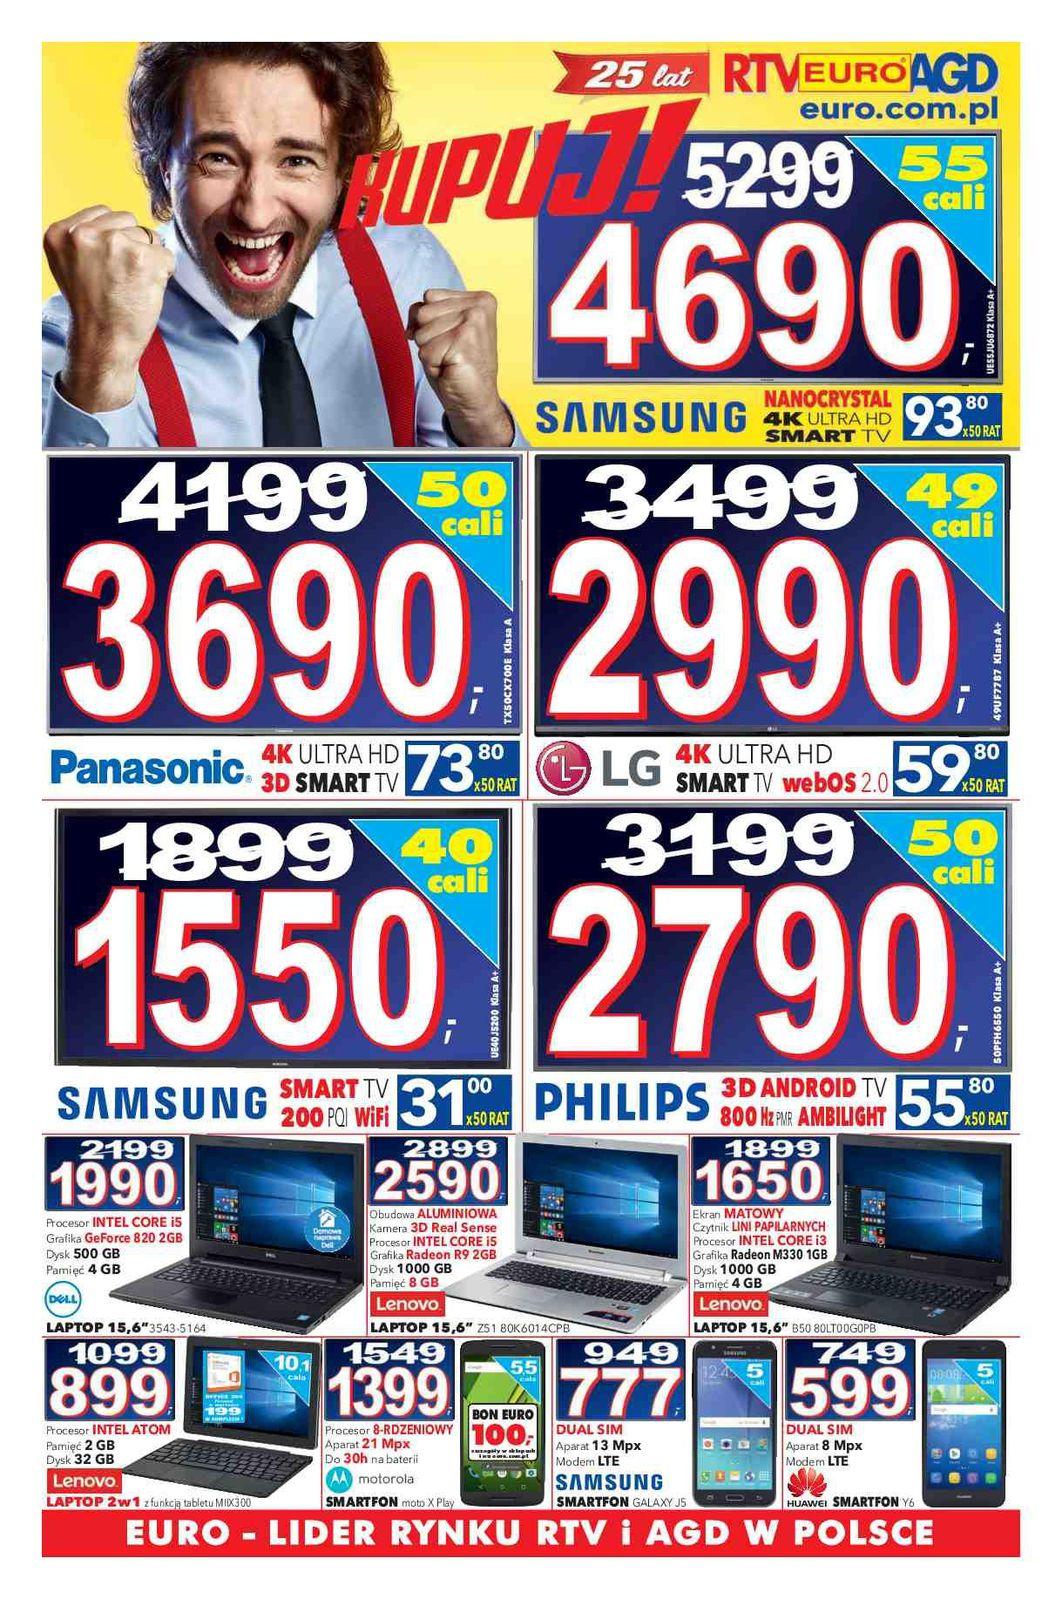 Gazetka promocyjna RTV Euro AGD do 31/12/2015 str.0